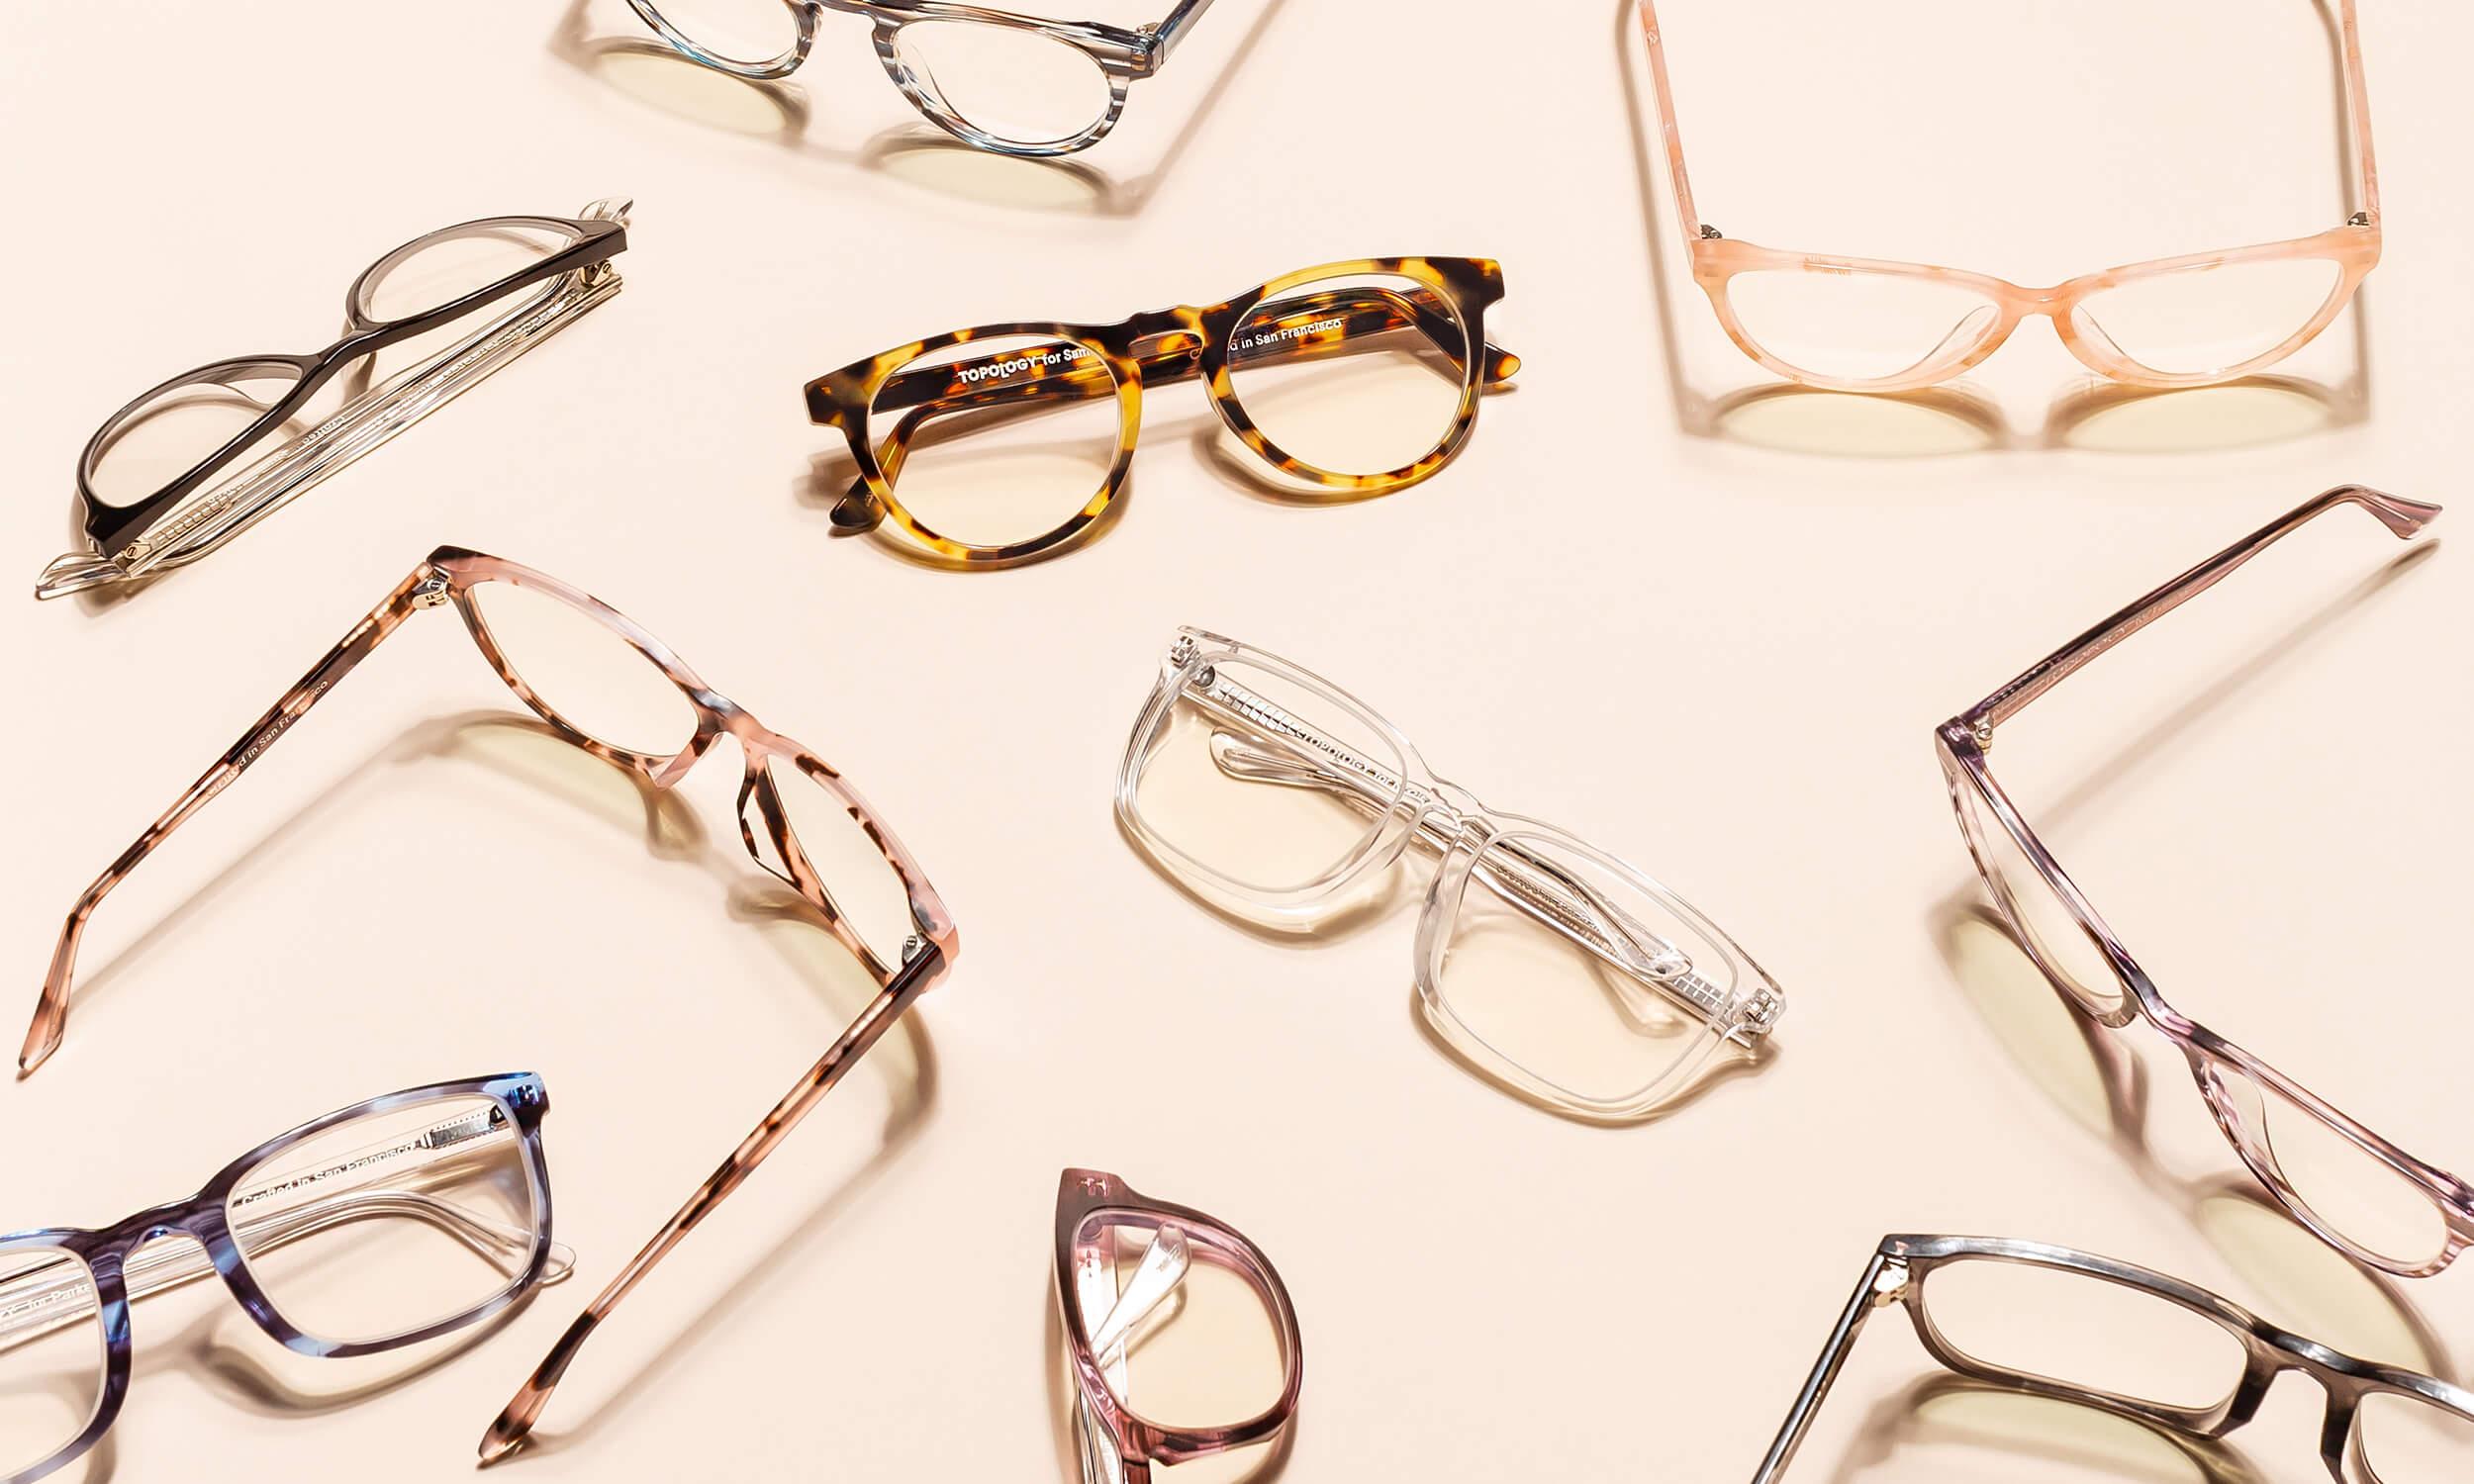 91c5a4de71de Topology  Custom-Tailored Glasses   Sunglasses